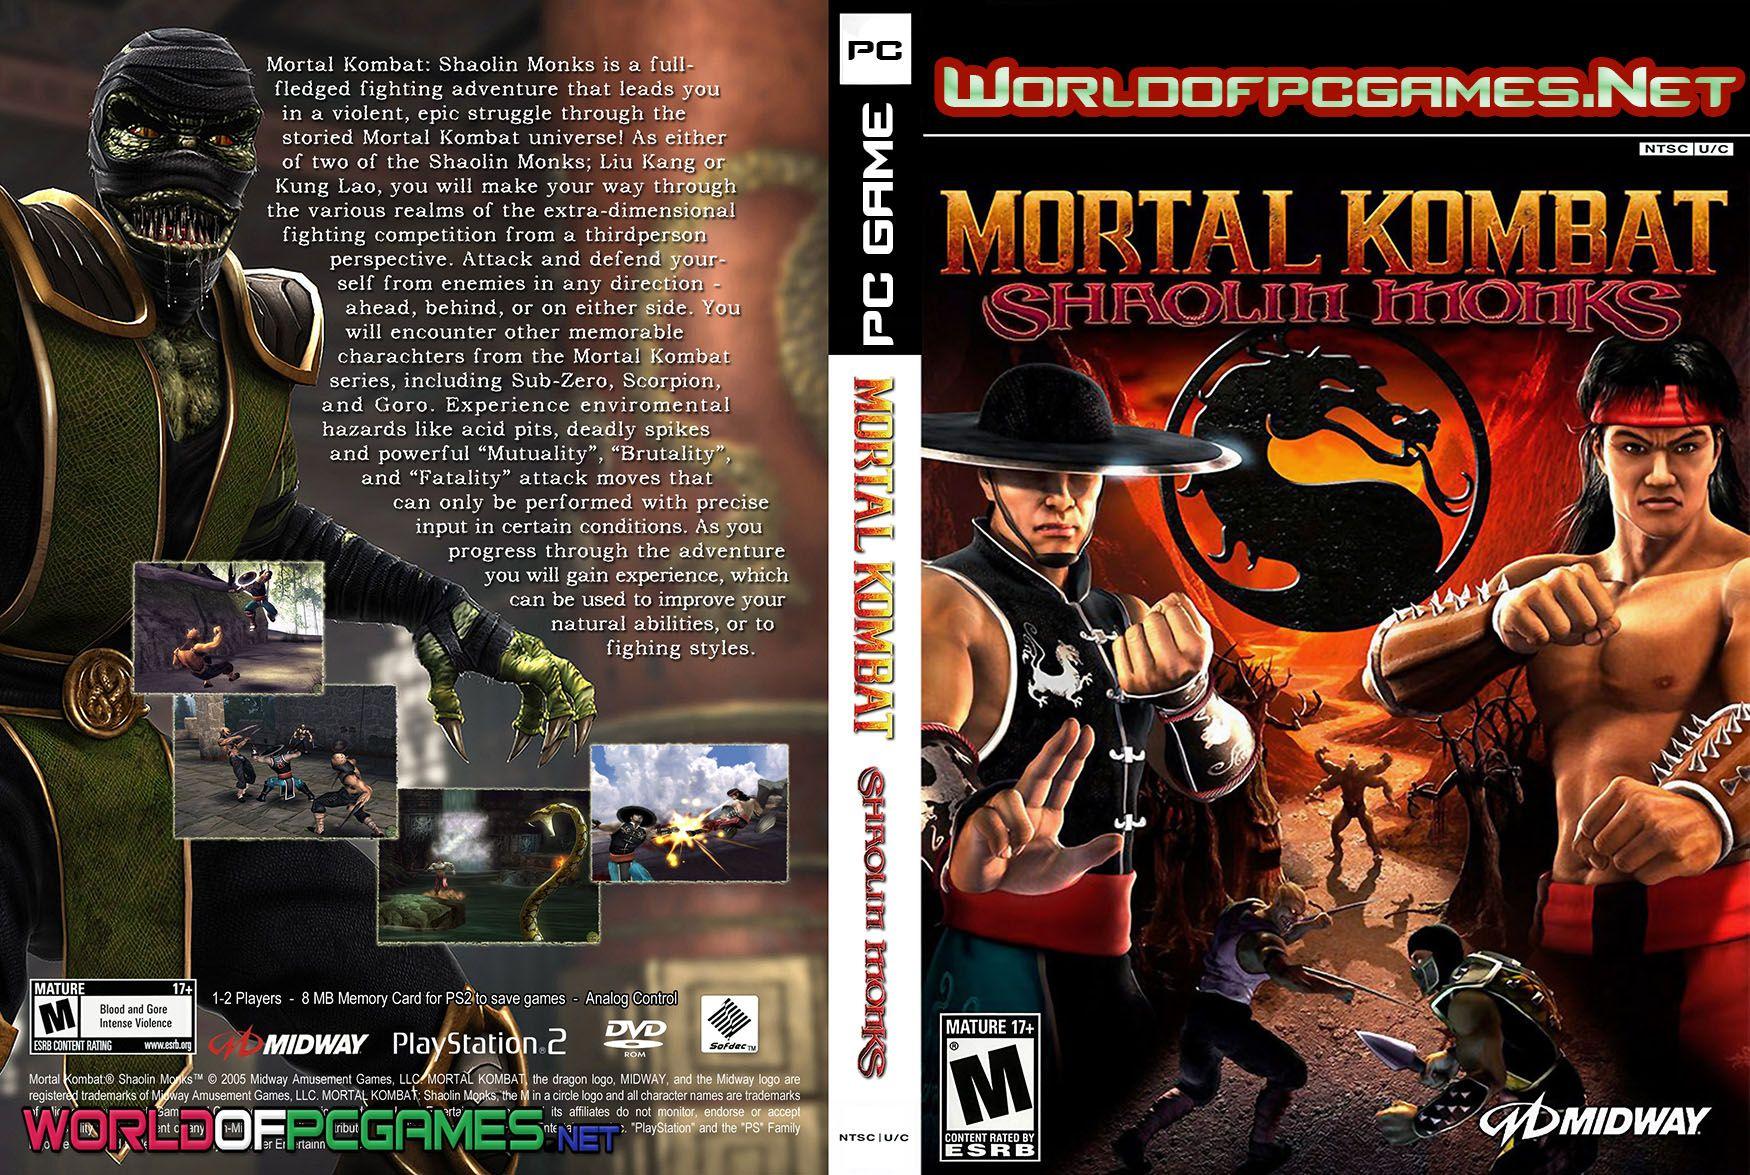 Pin By Muu Hamed On Free Download Full Version Pc Games Mortal Kombat Shaolin Monks Mortal Kombat Shaolin Monks